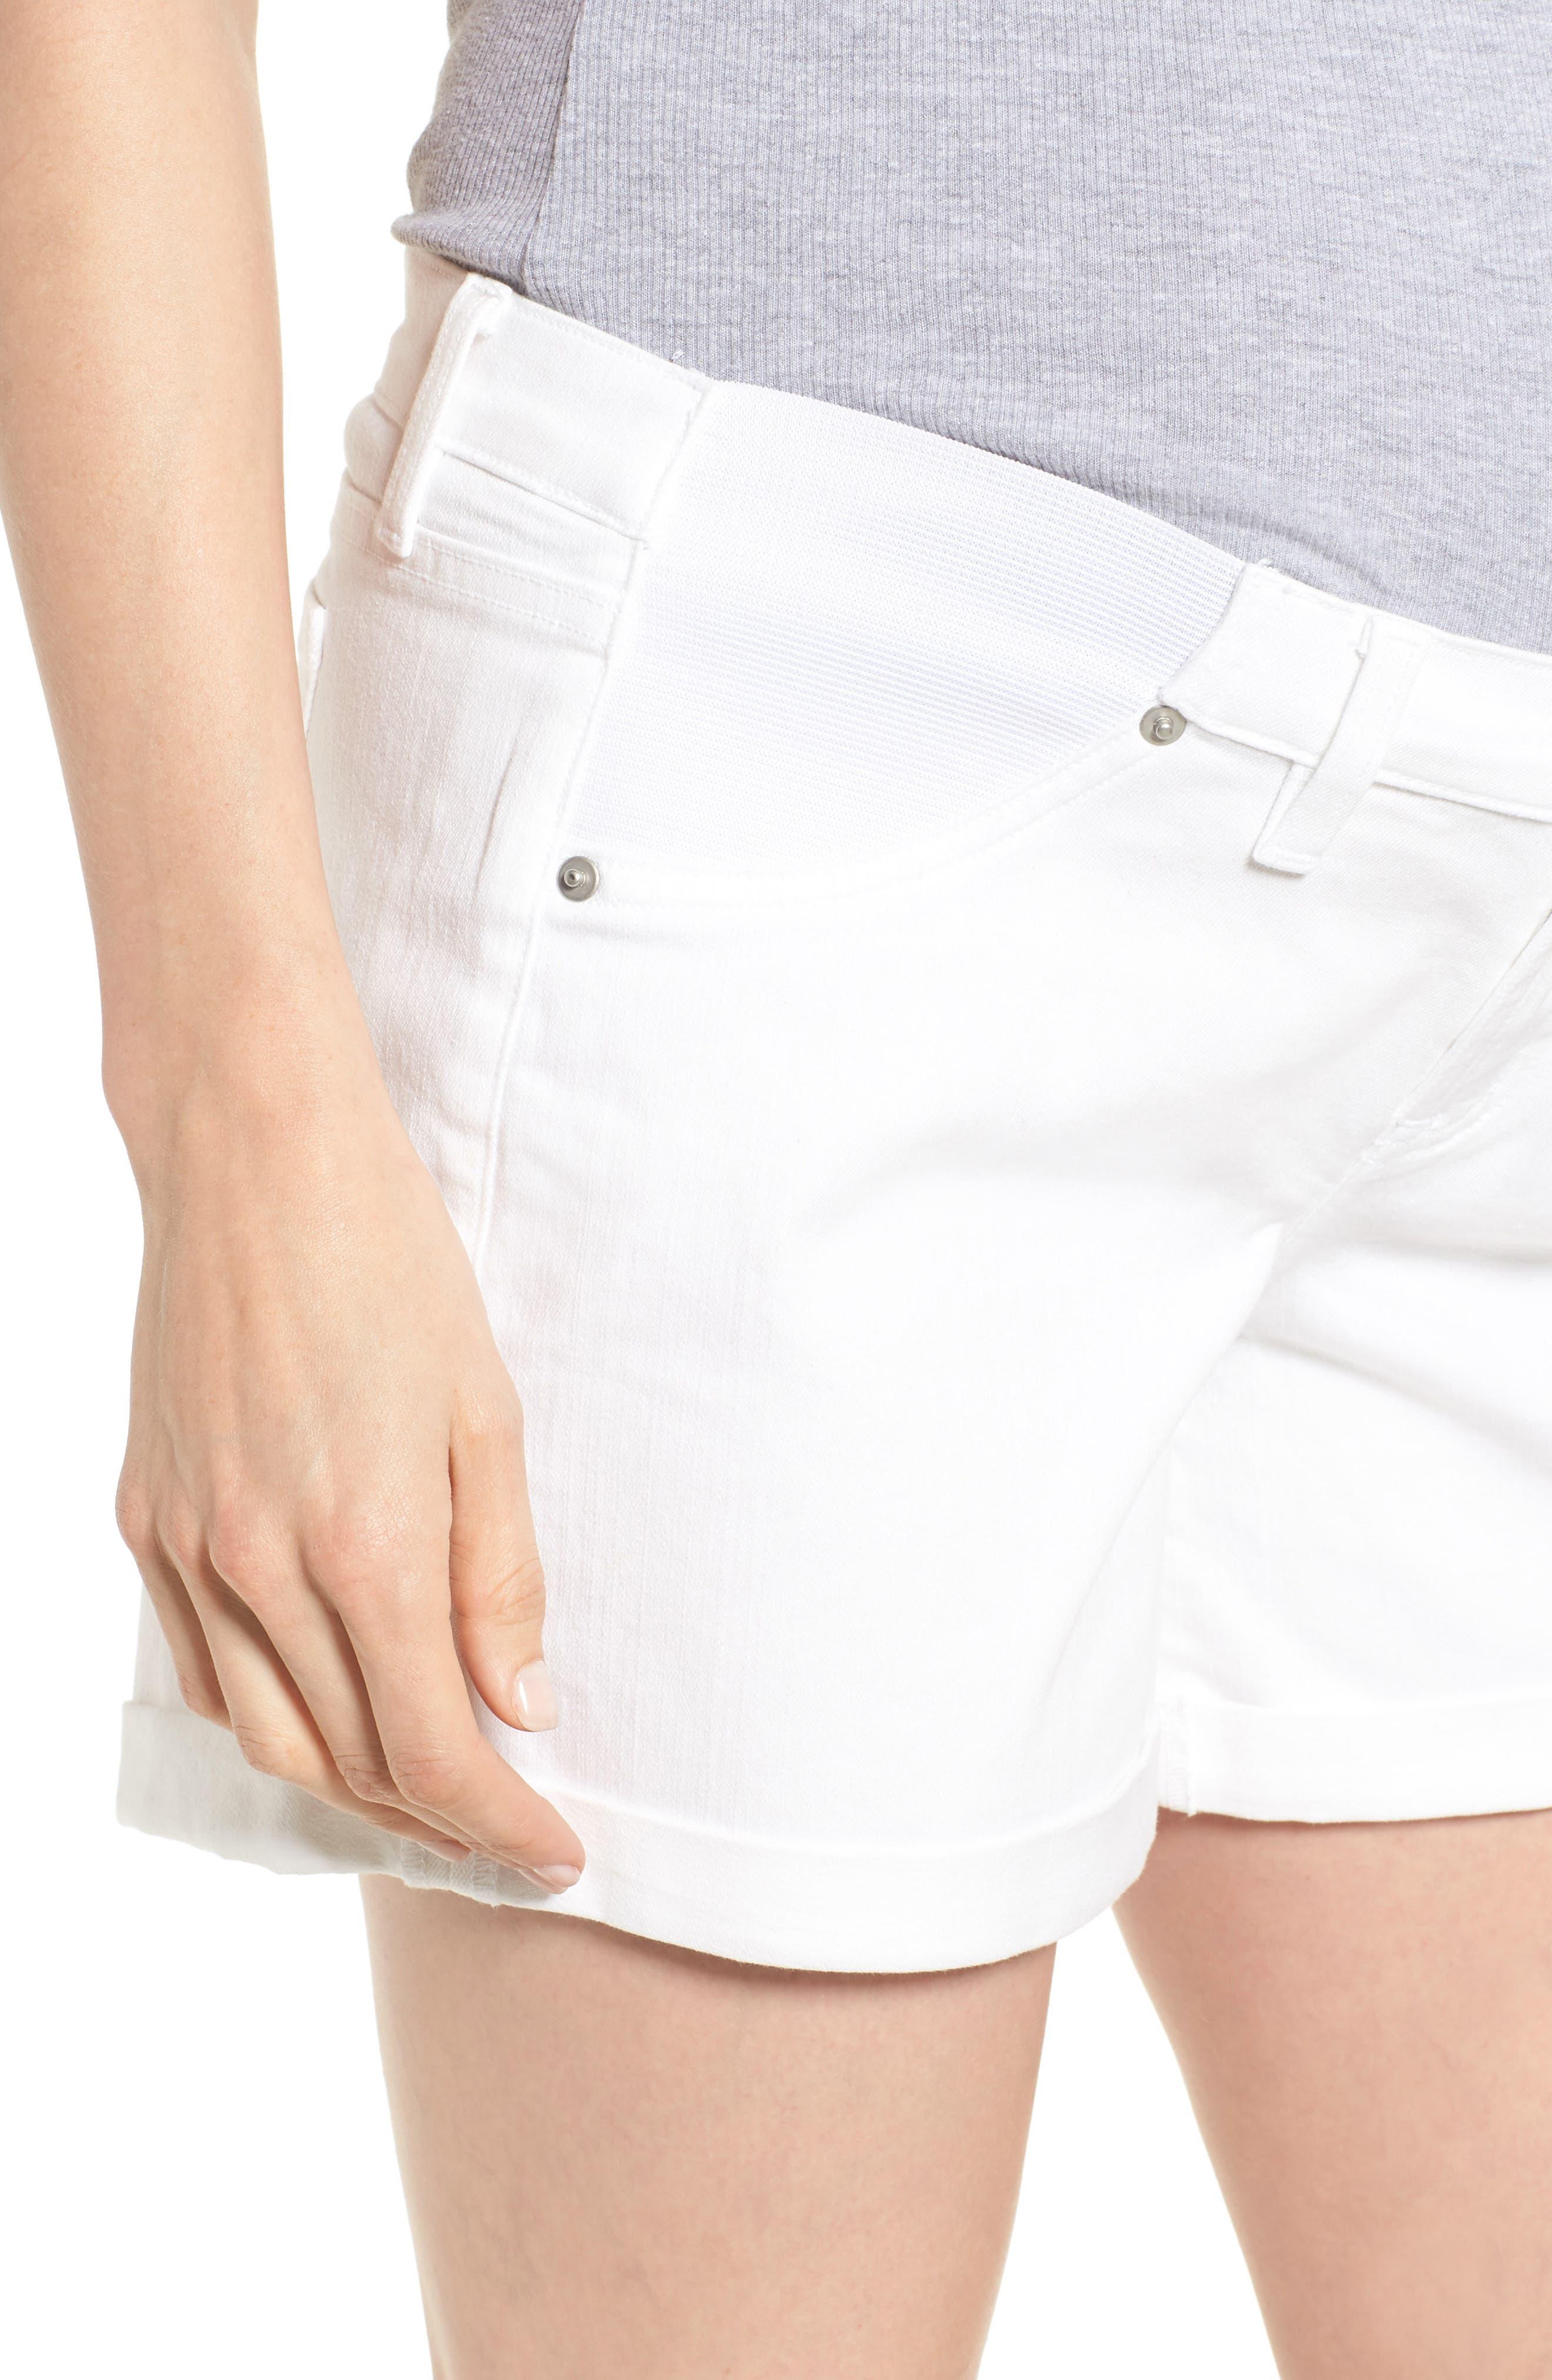 Mia Maternity Boyfriend Shorts,                             Alternate thumbnail 4, color,                             White